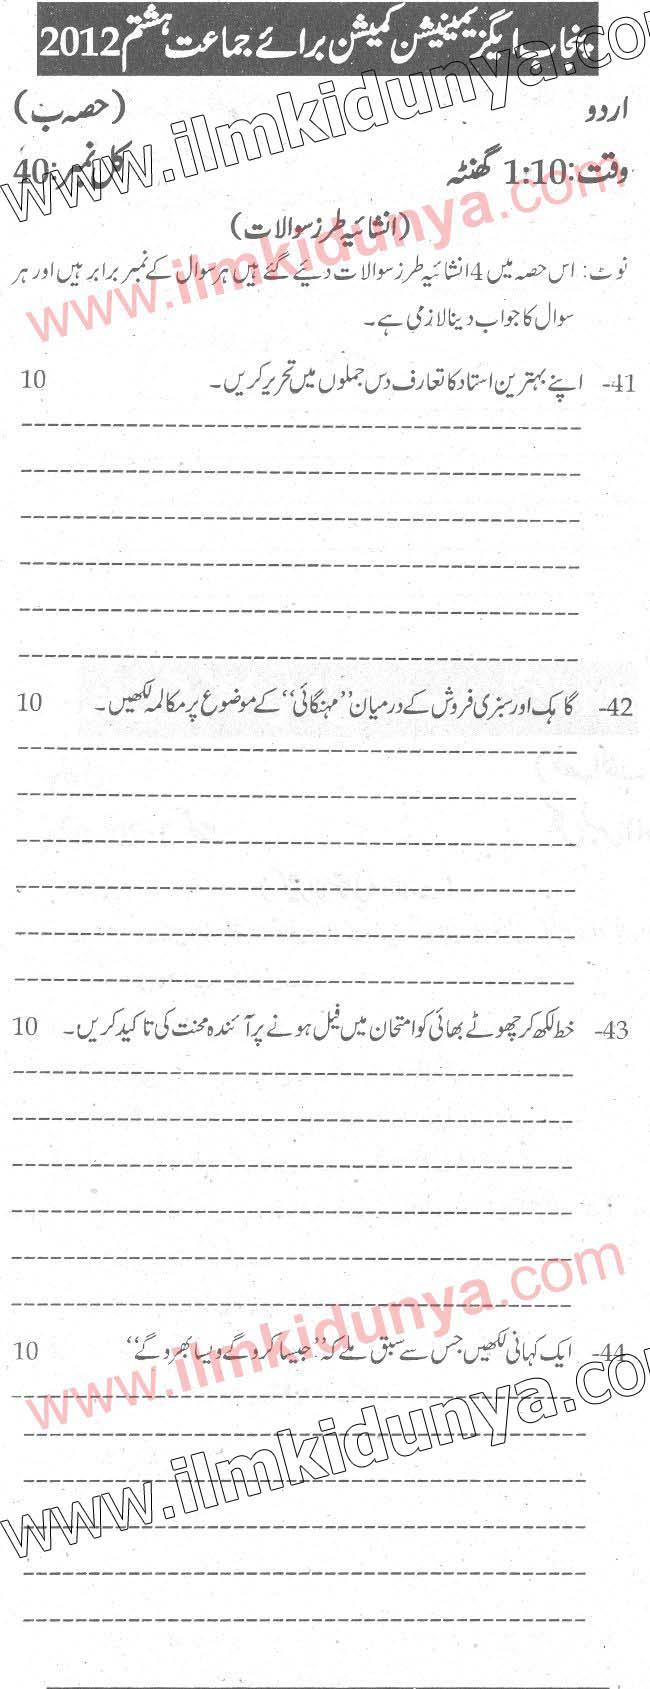 Punjab Examination Commission (PEC) 8th Class Past Paper